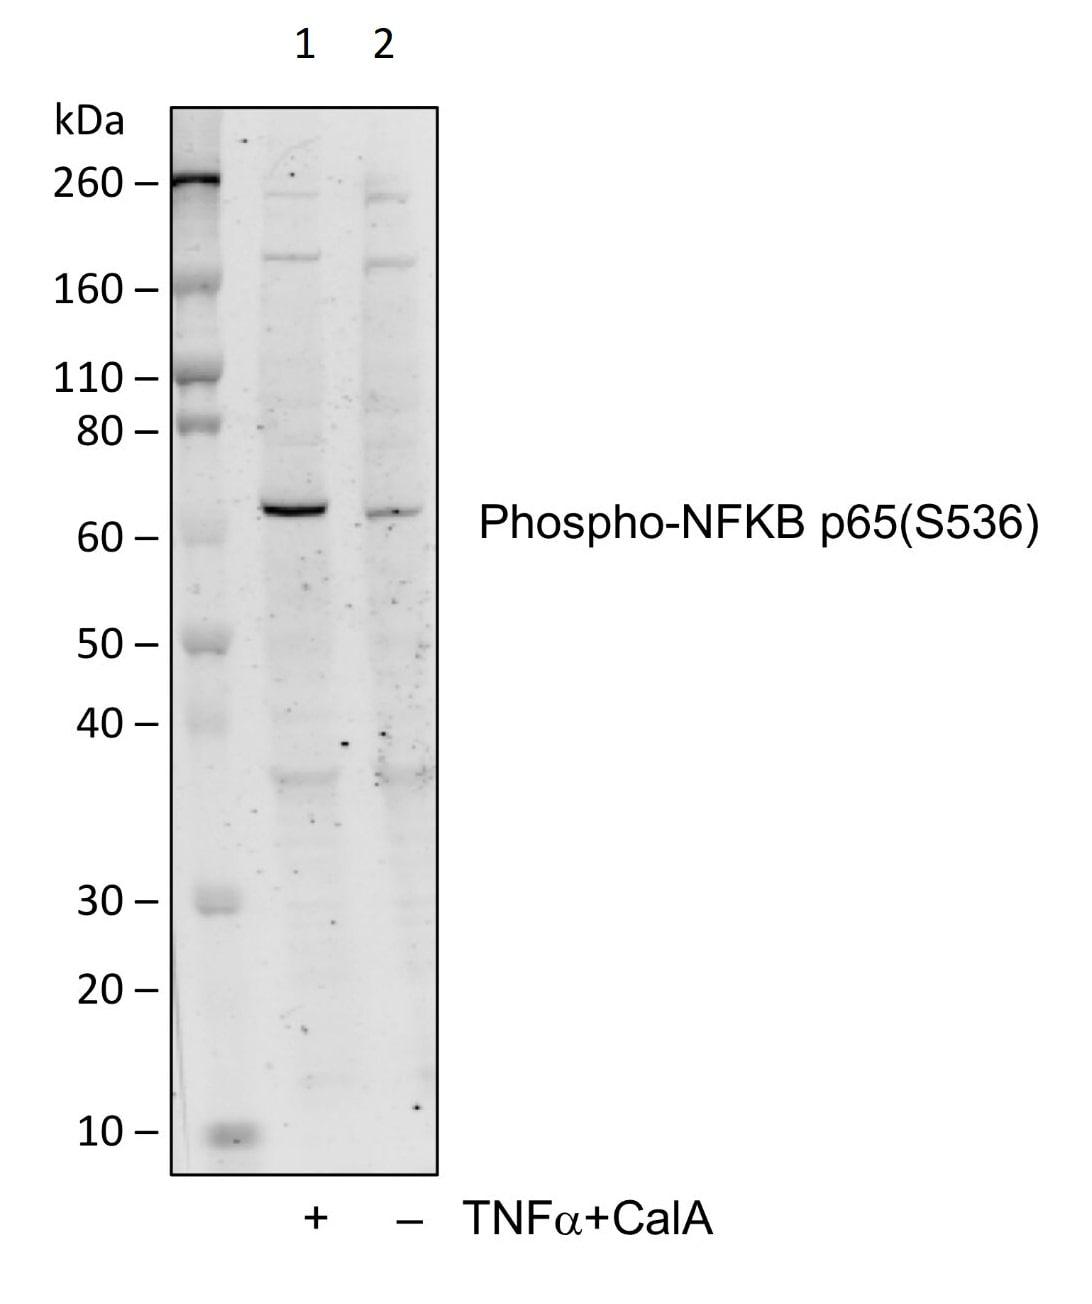 Western blot - Anti-NF-kB p65 (phospho S536) antibody [NFKBp65S536-B7] (ab278777)